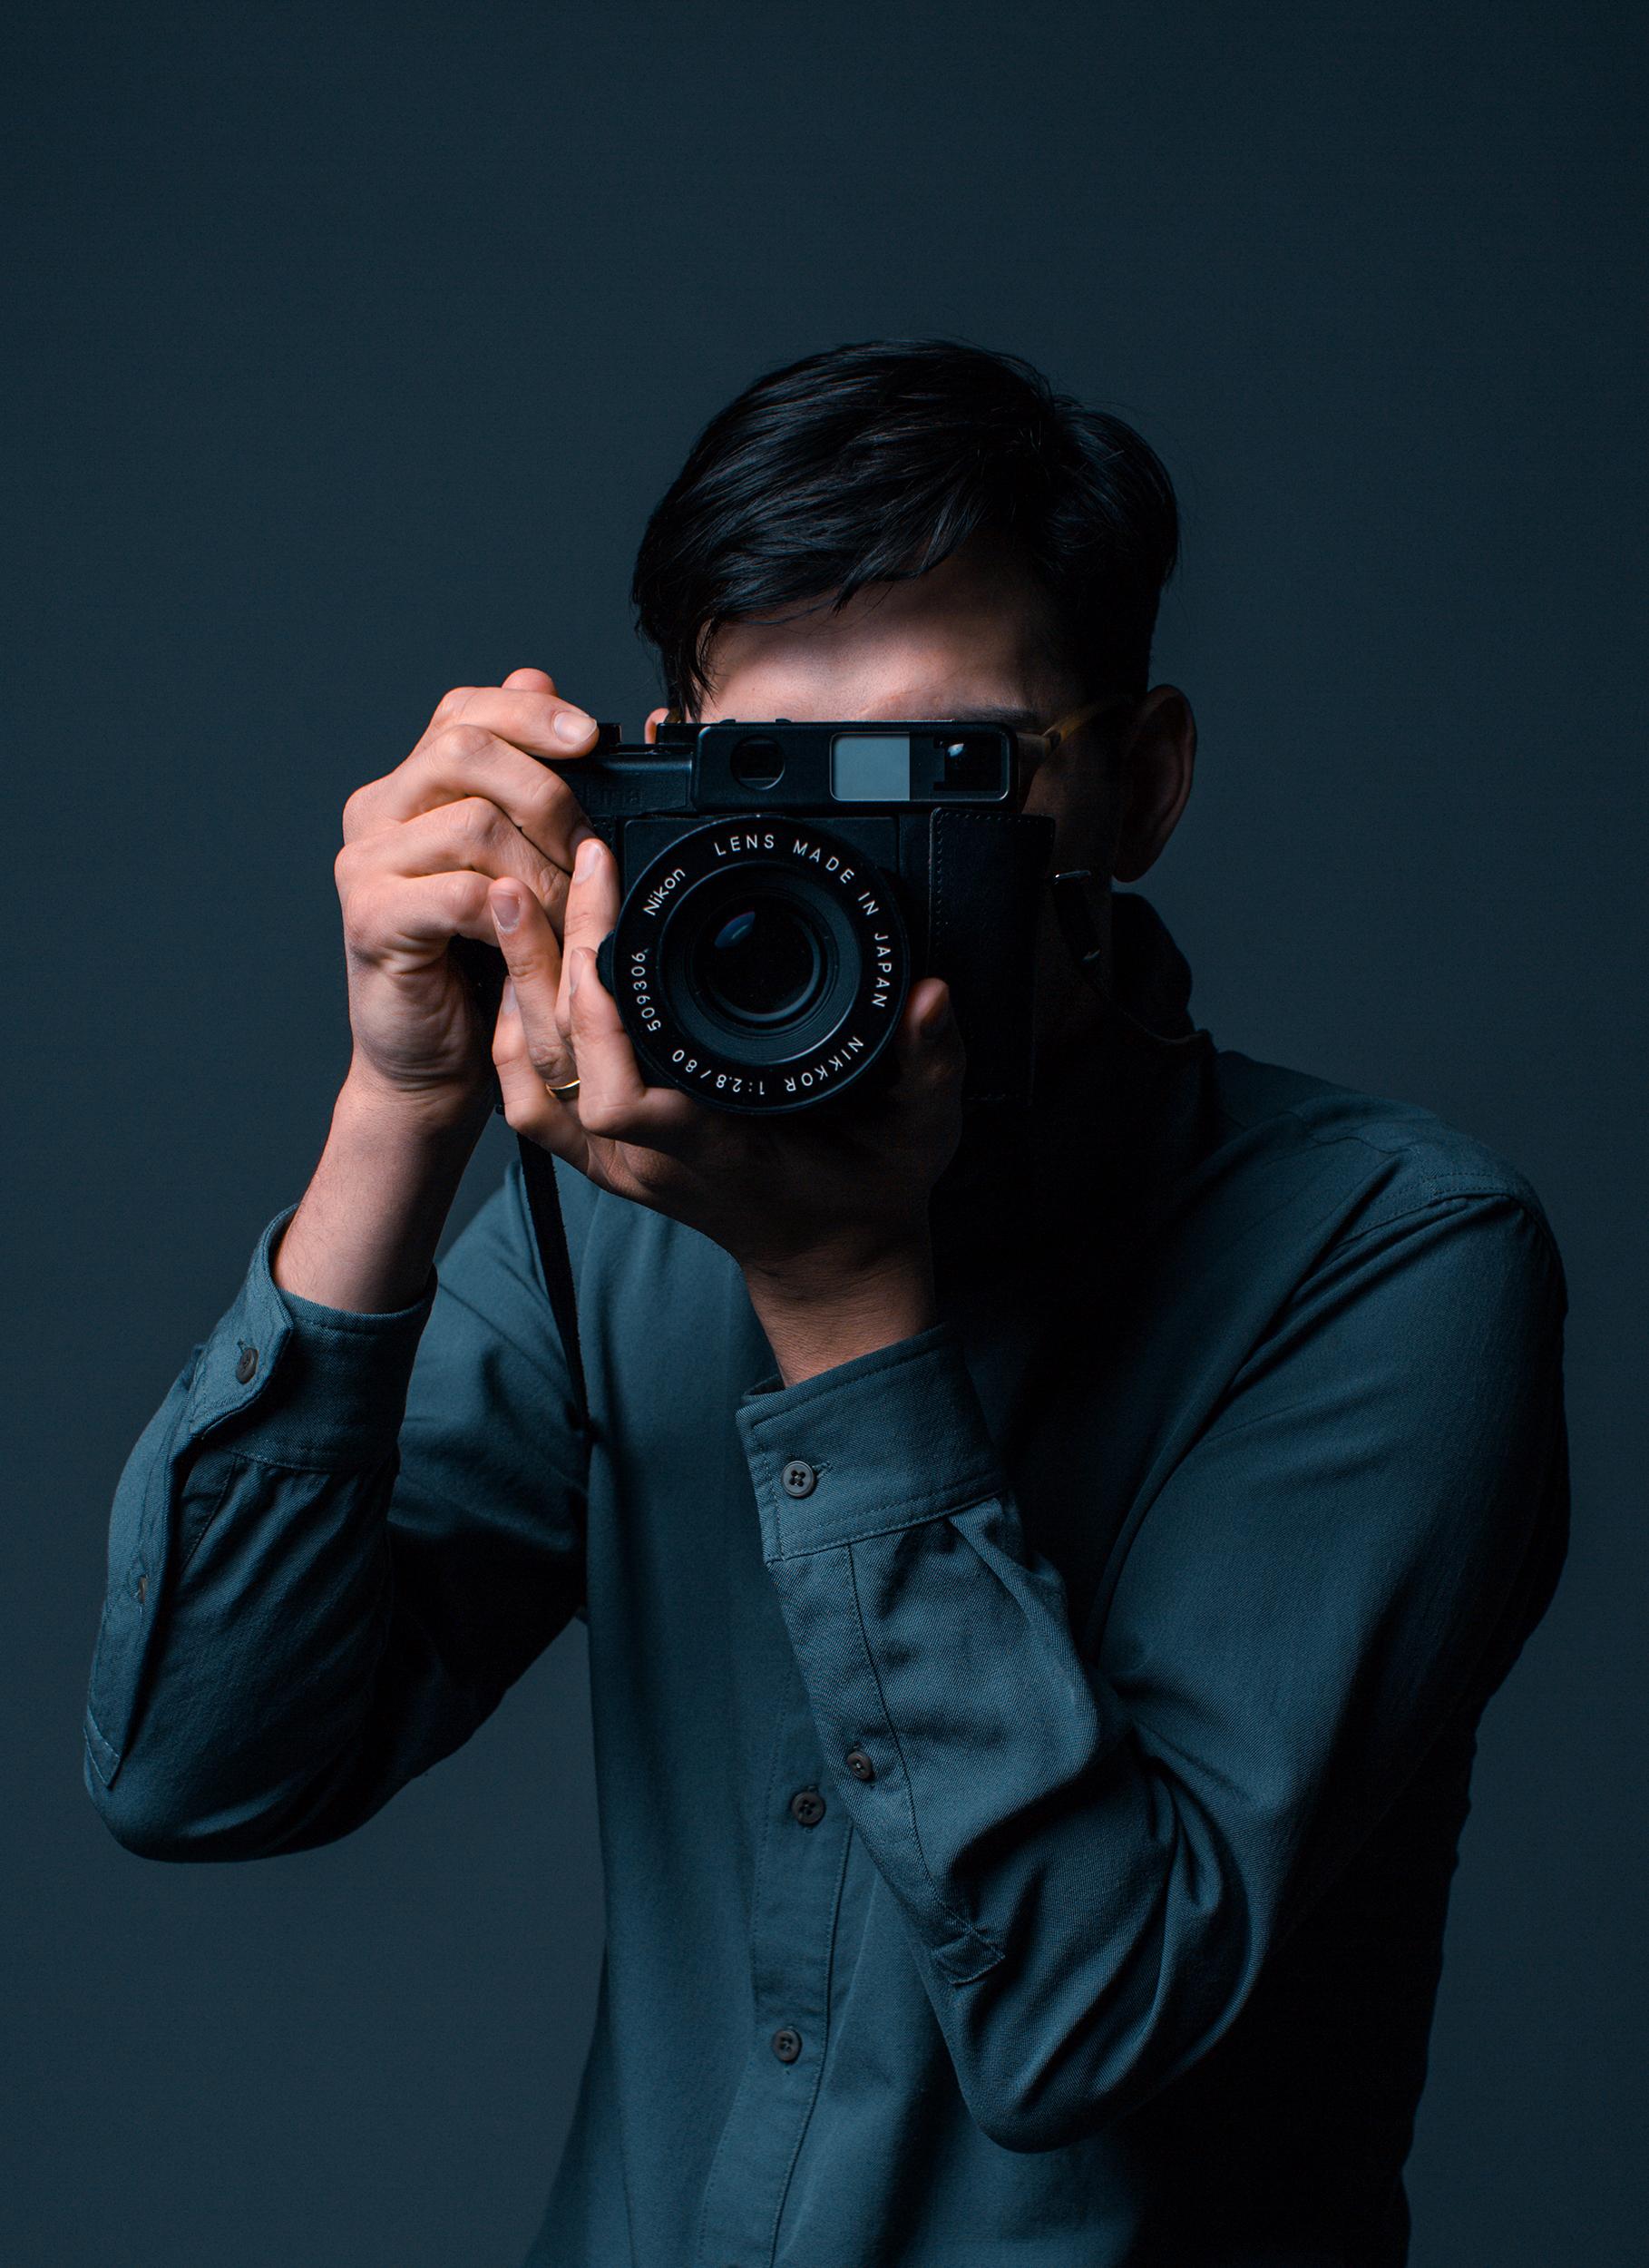 Ian, Cinematographer